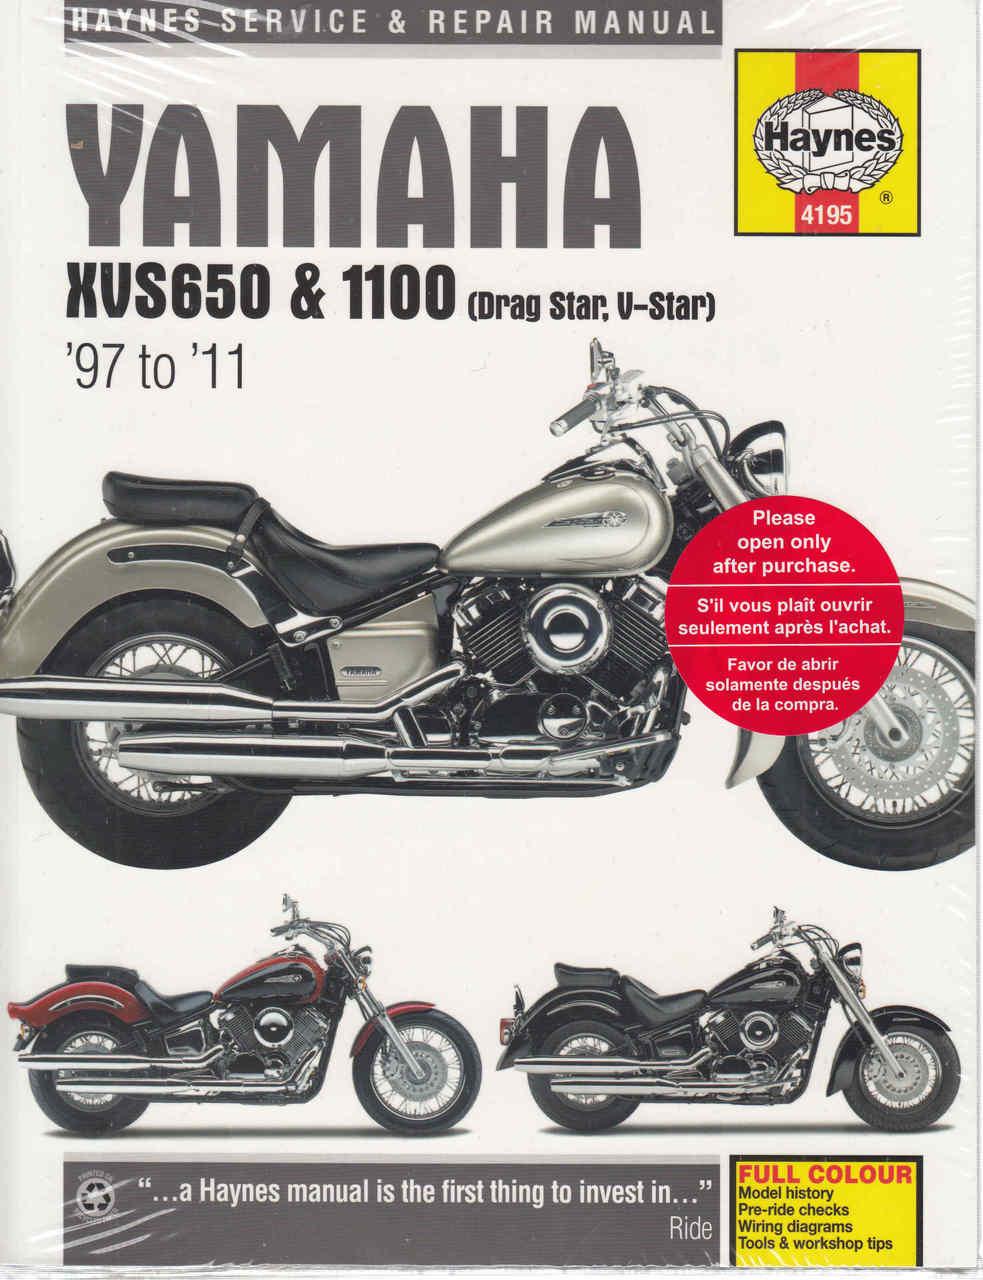 yamaha xvs650 amp xvs1100 drag star v star 1997 2005 workshop manual [ 983 x 1280 Pixel ]